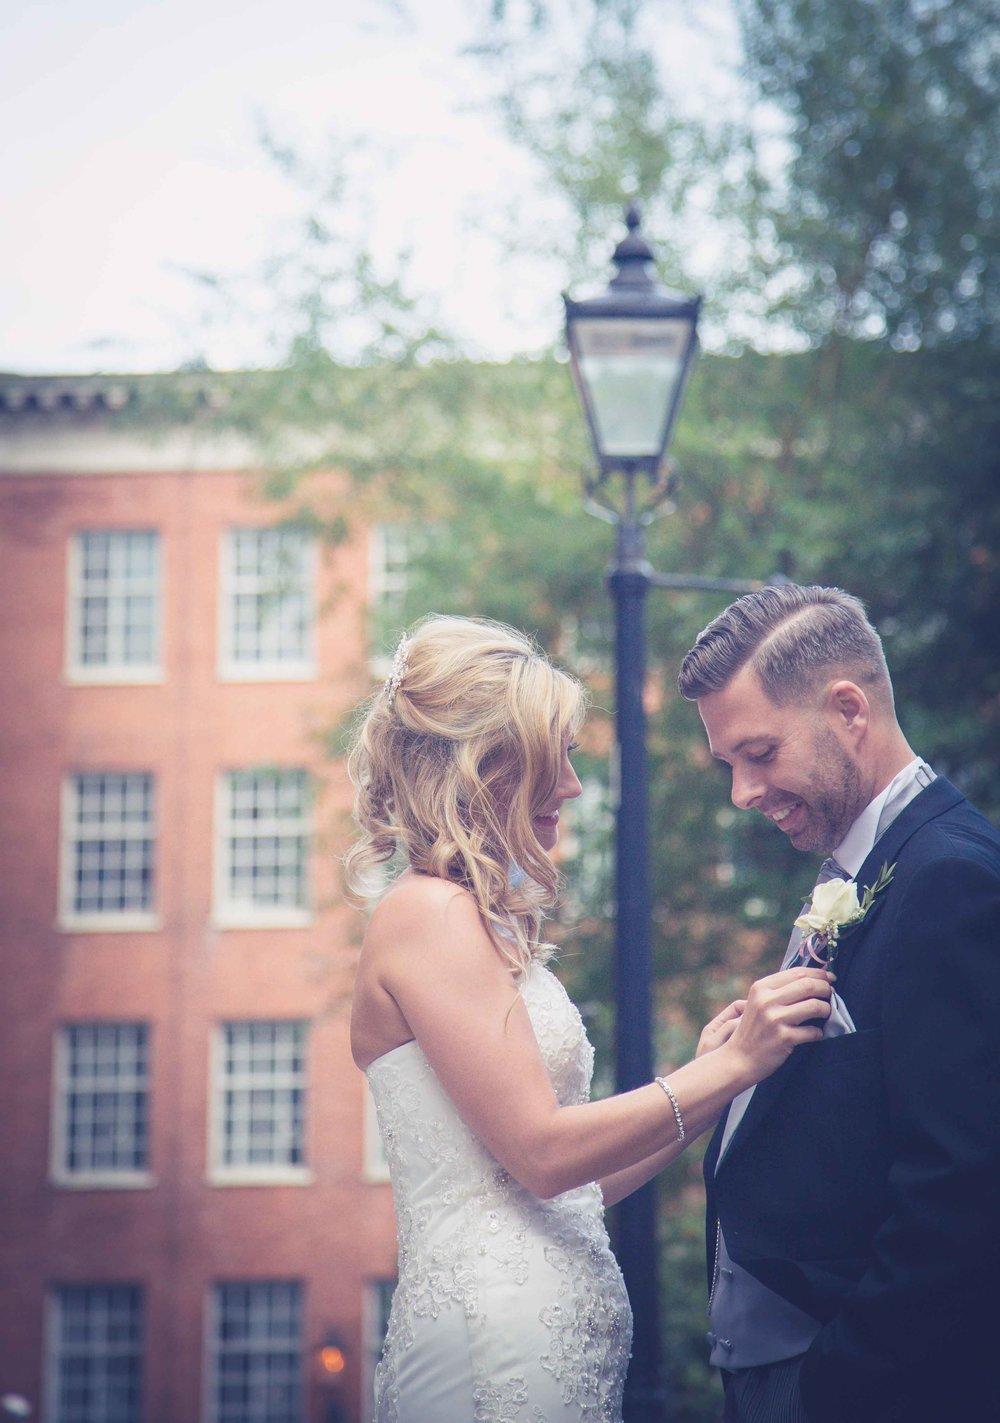 Rauquet_Club_Wedding_photography_Liverpool_heatherelizabethphotography (133 of 164).jpg